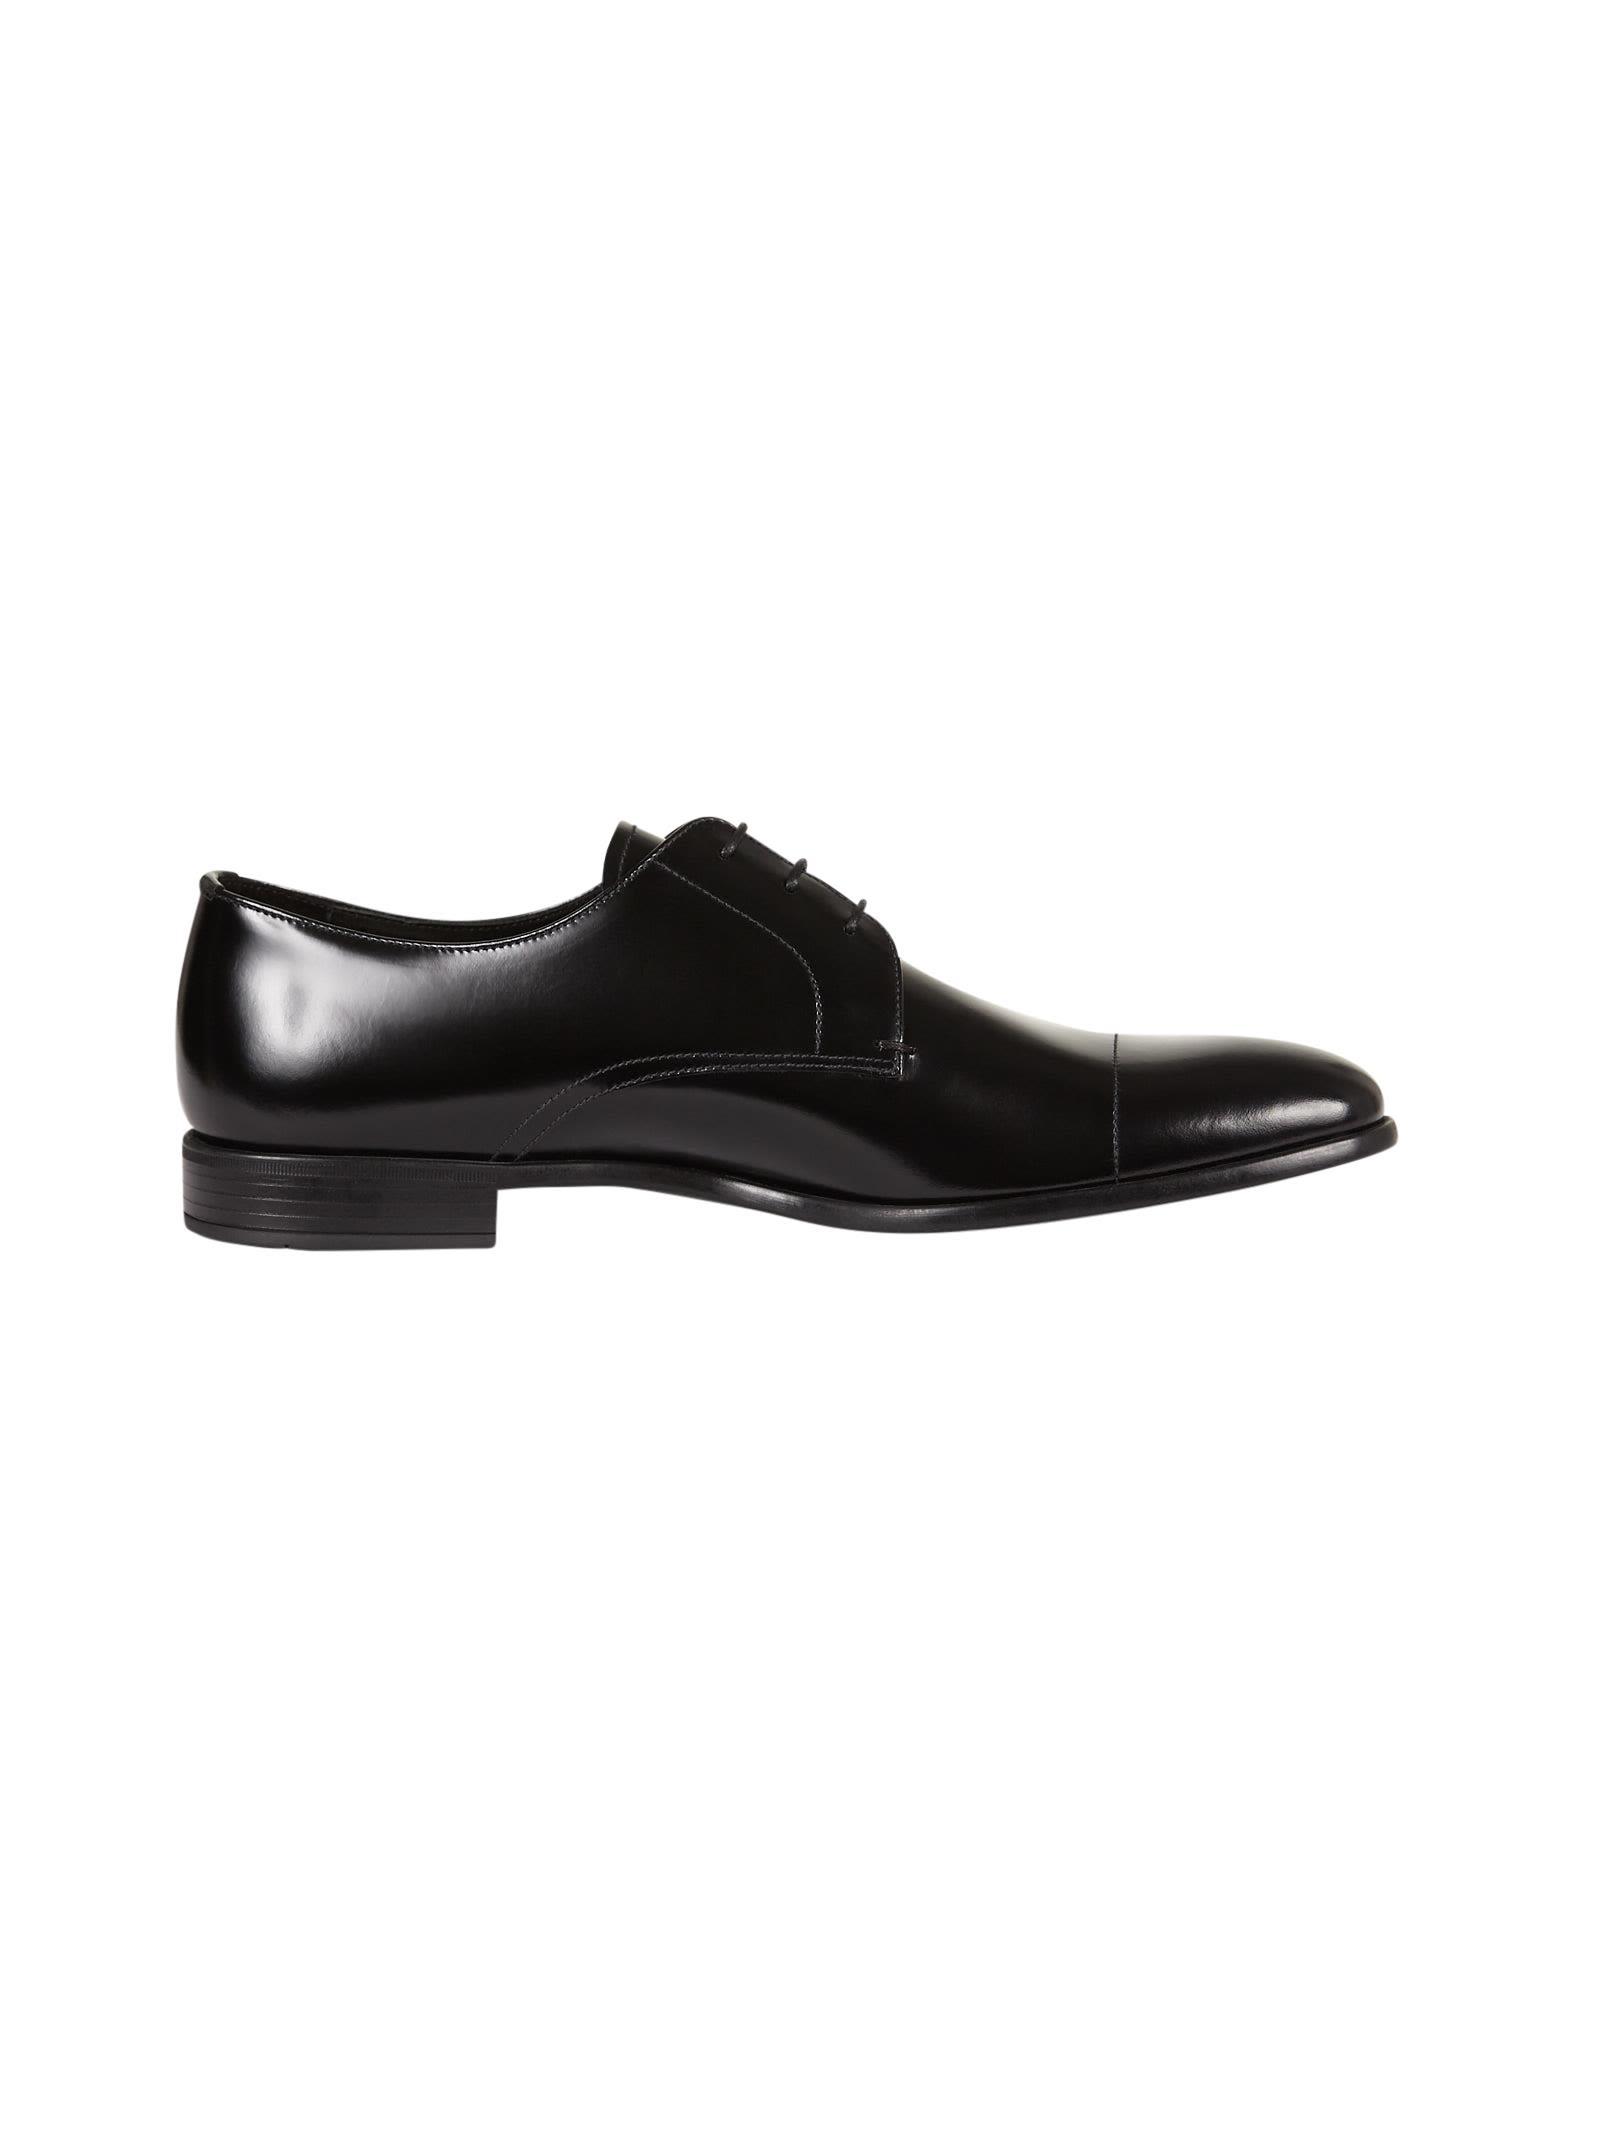 Prada Square Toe Oxford Shoes